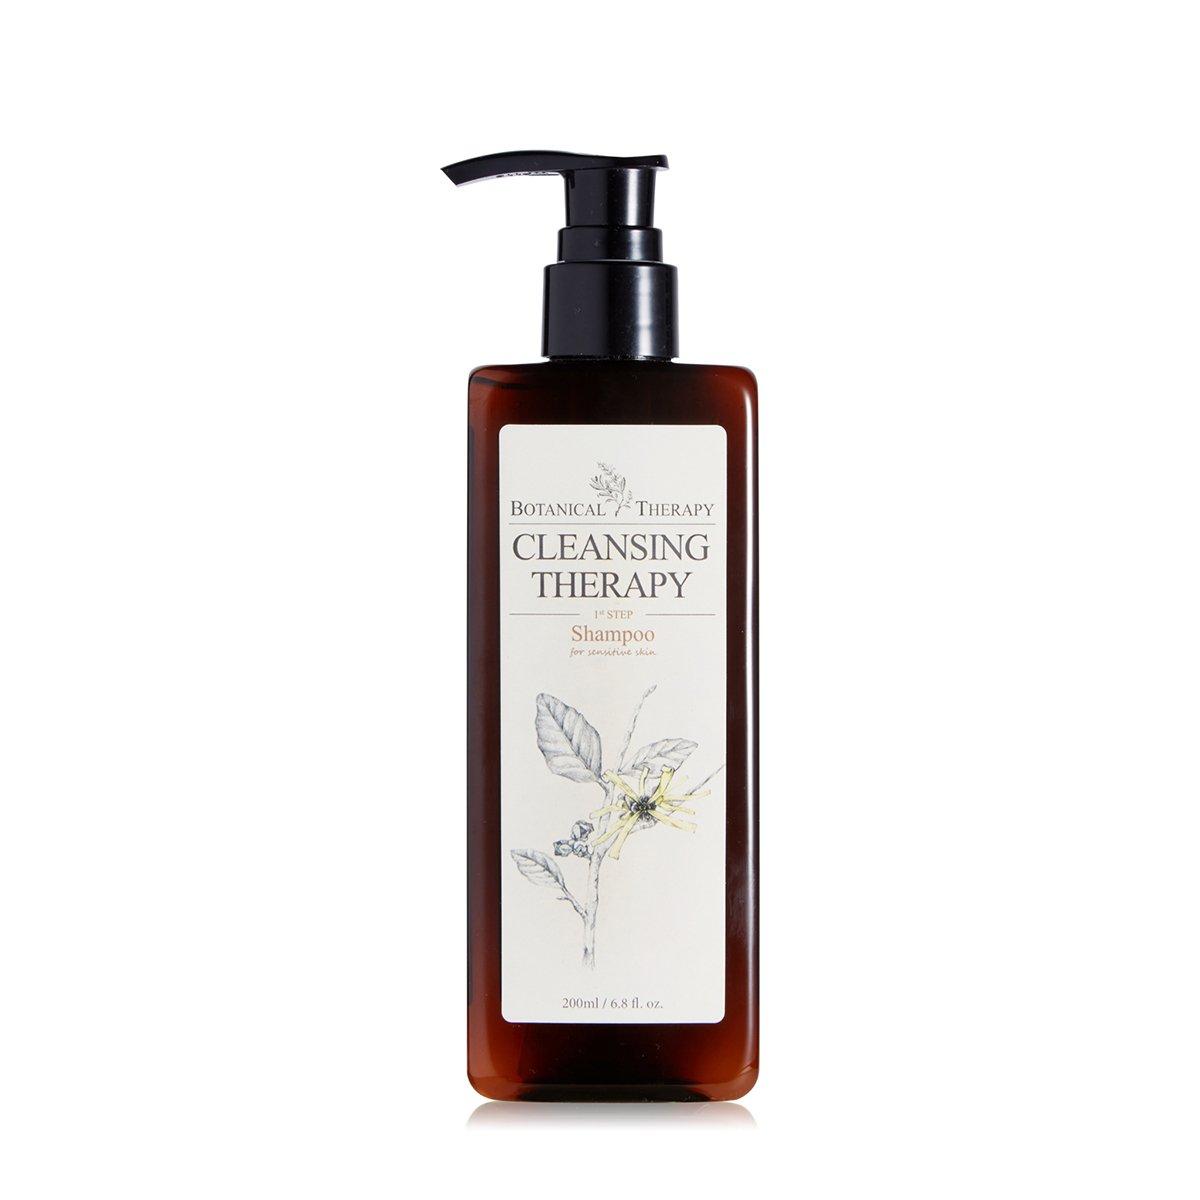 Botanical Therapy - Baby Shampoo (6.8 fl/oz)